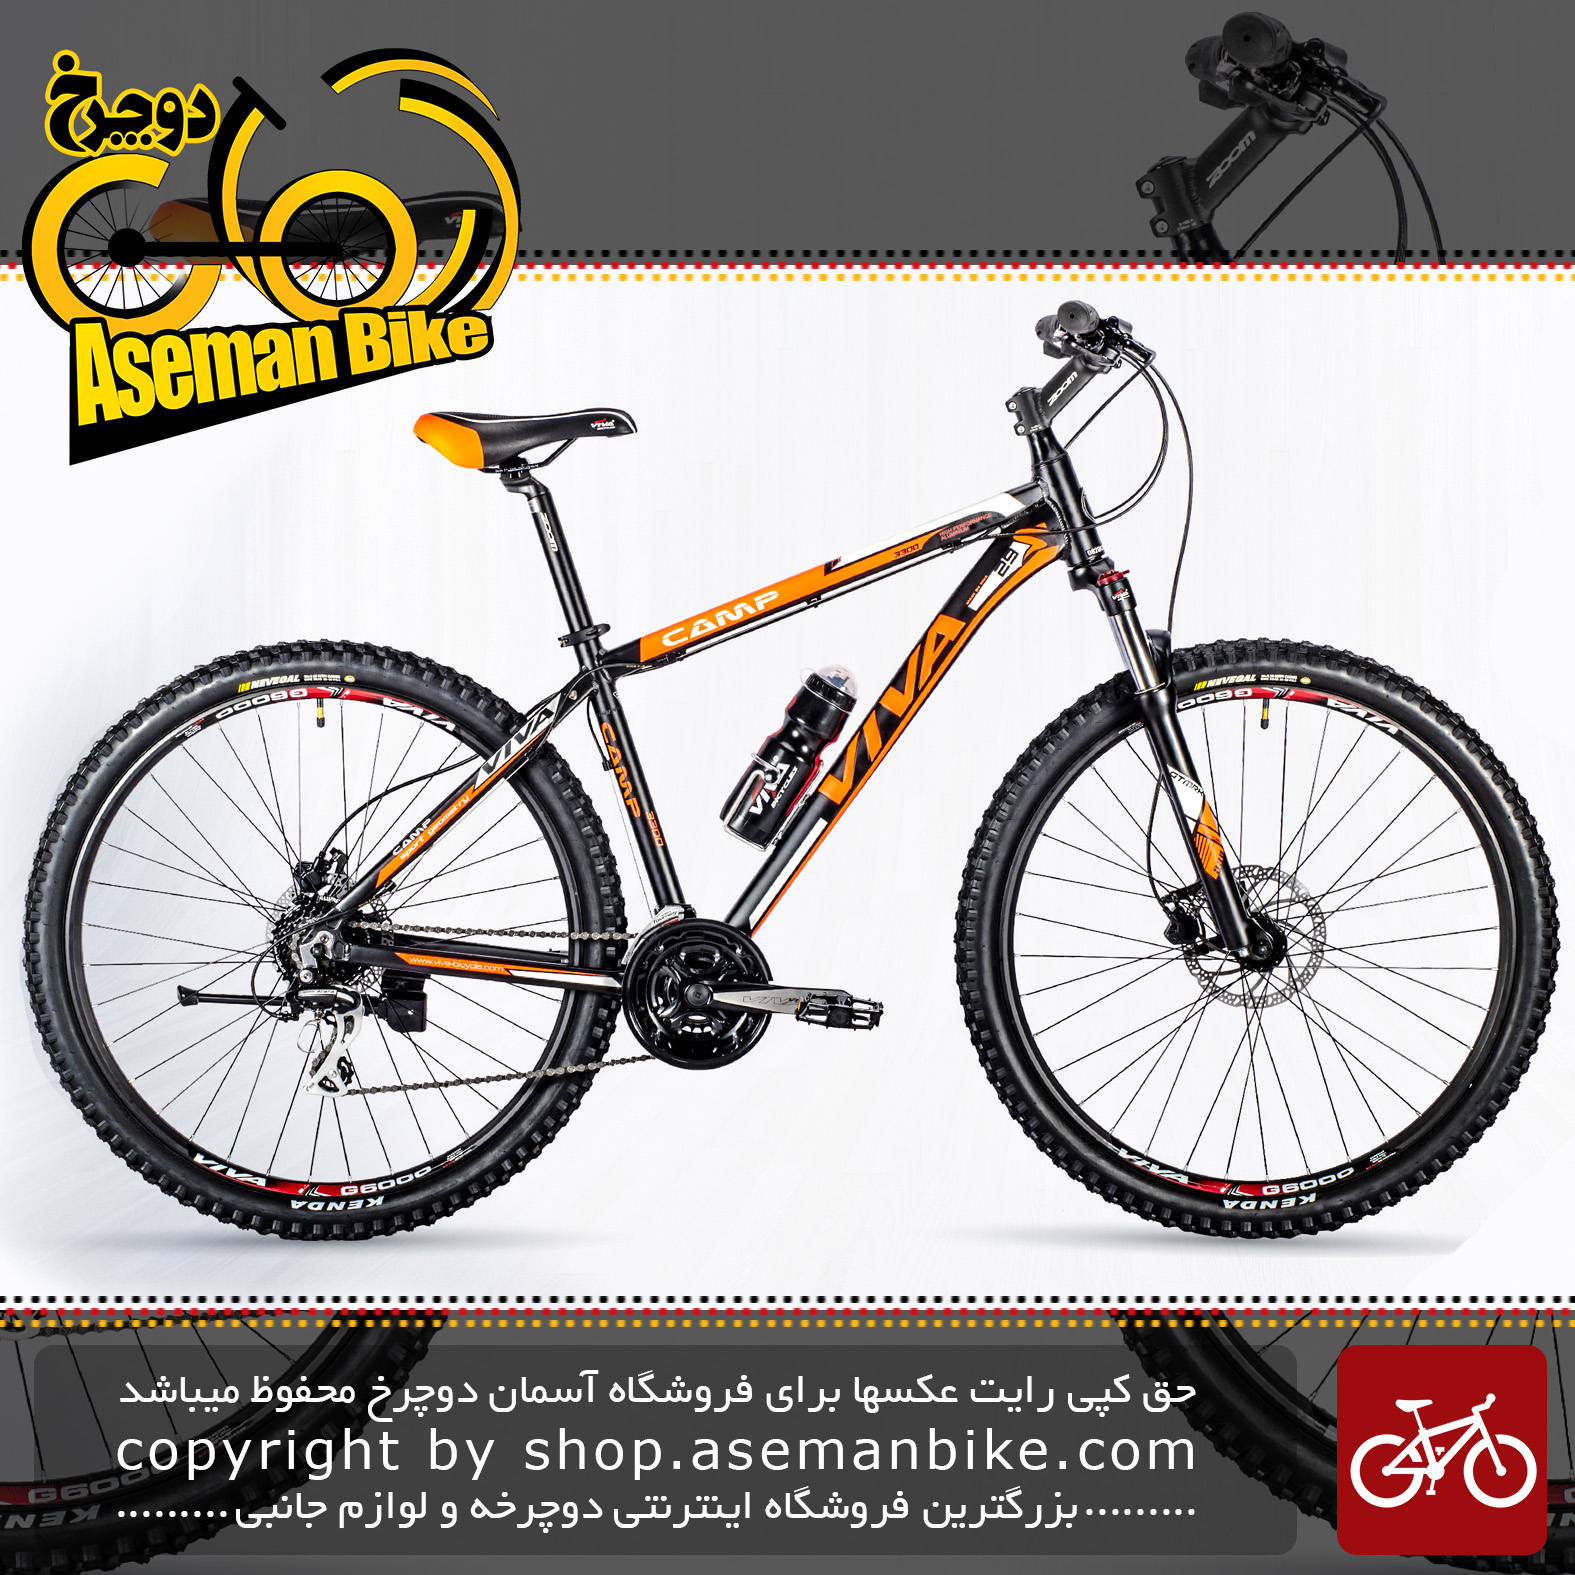 دوچرخه کوهستان شهری ویوا مدل کمپ سایز 29 Viva Mountain Bicycle Camp 29 2018